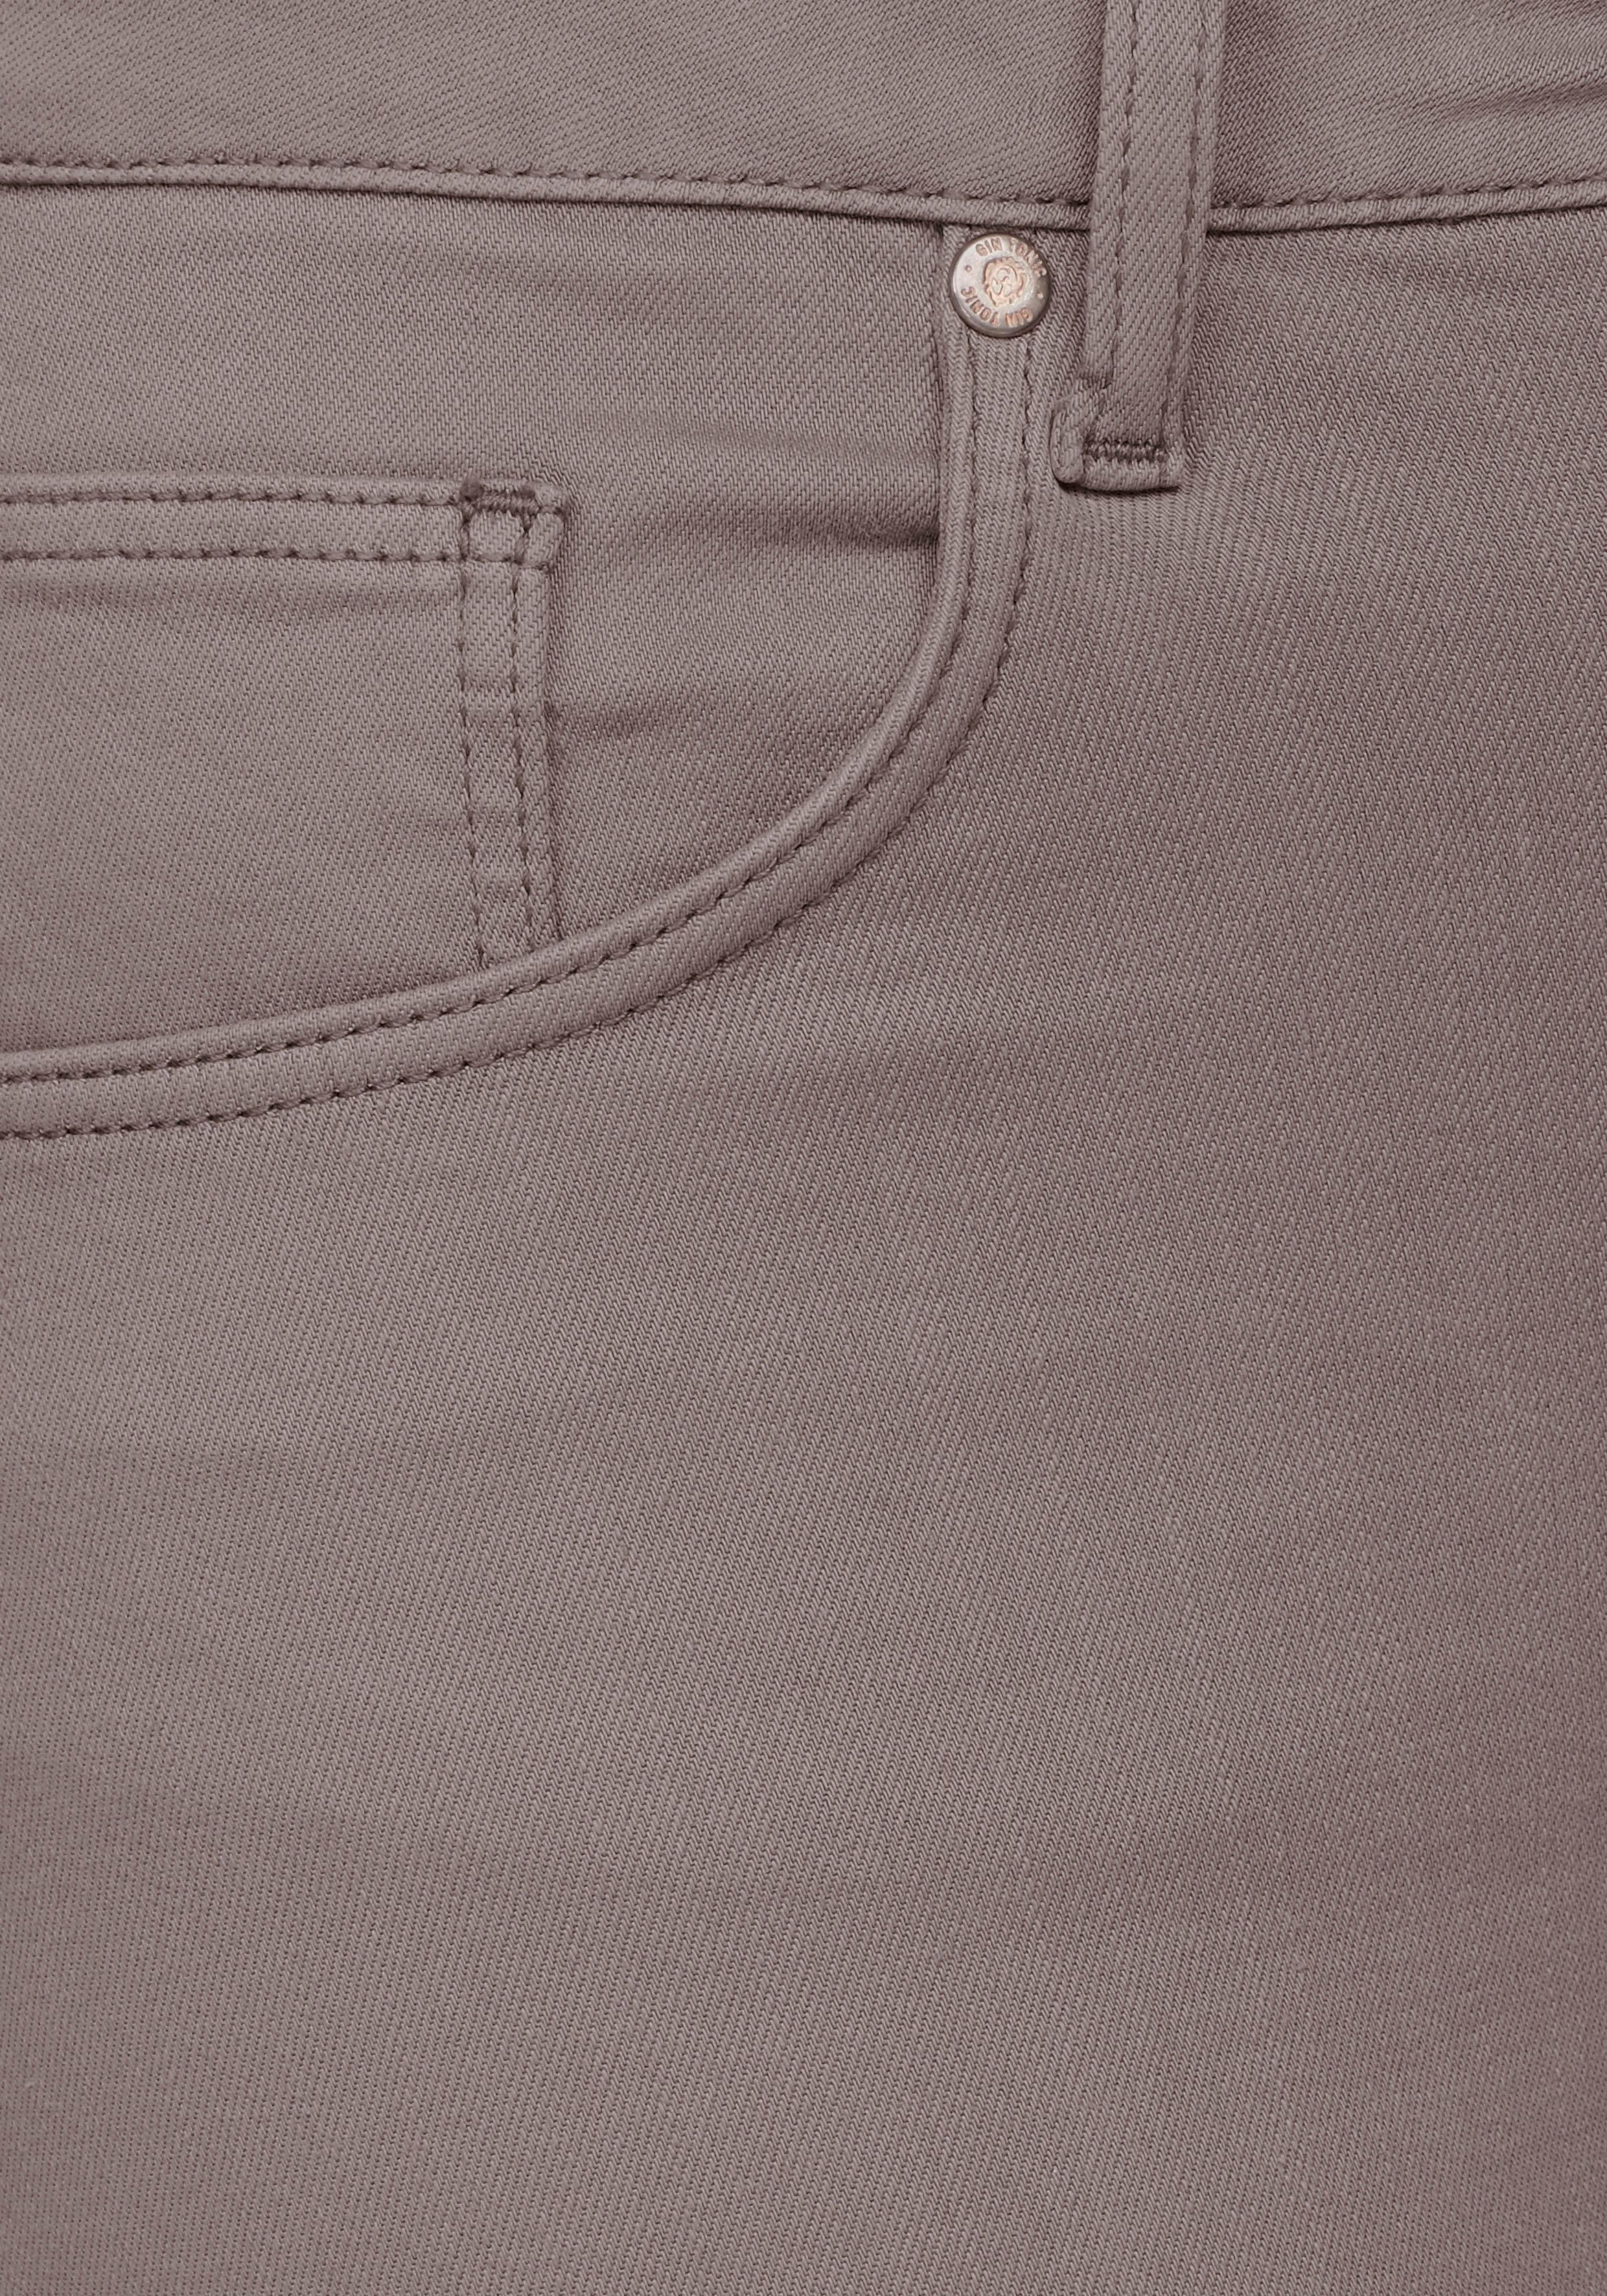 Gin Skinny jeansBestel Tonic Nu Bij AjLq5R43